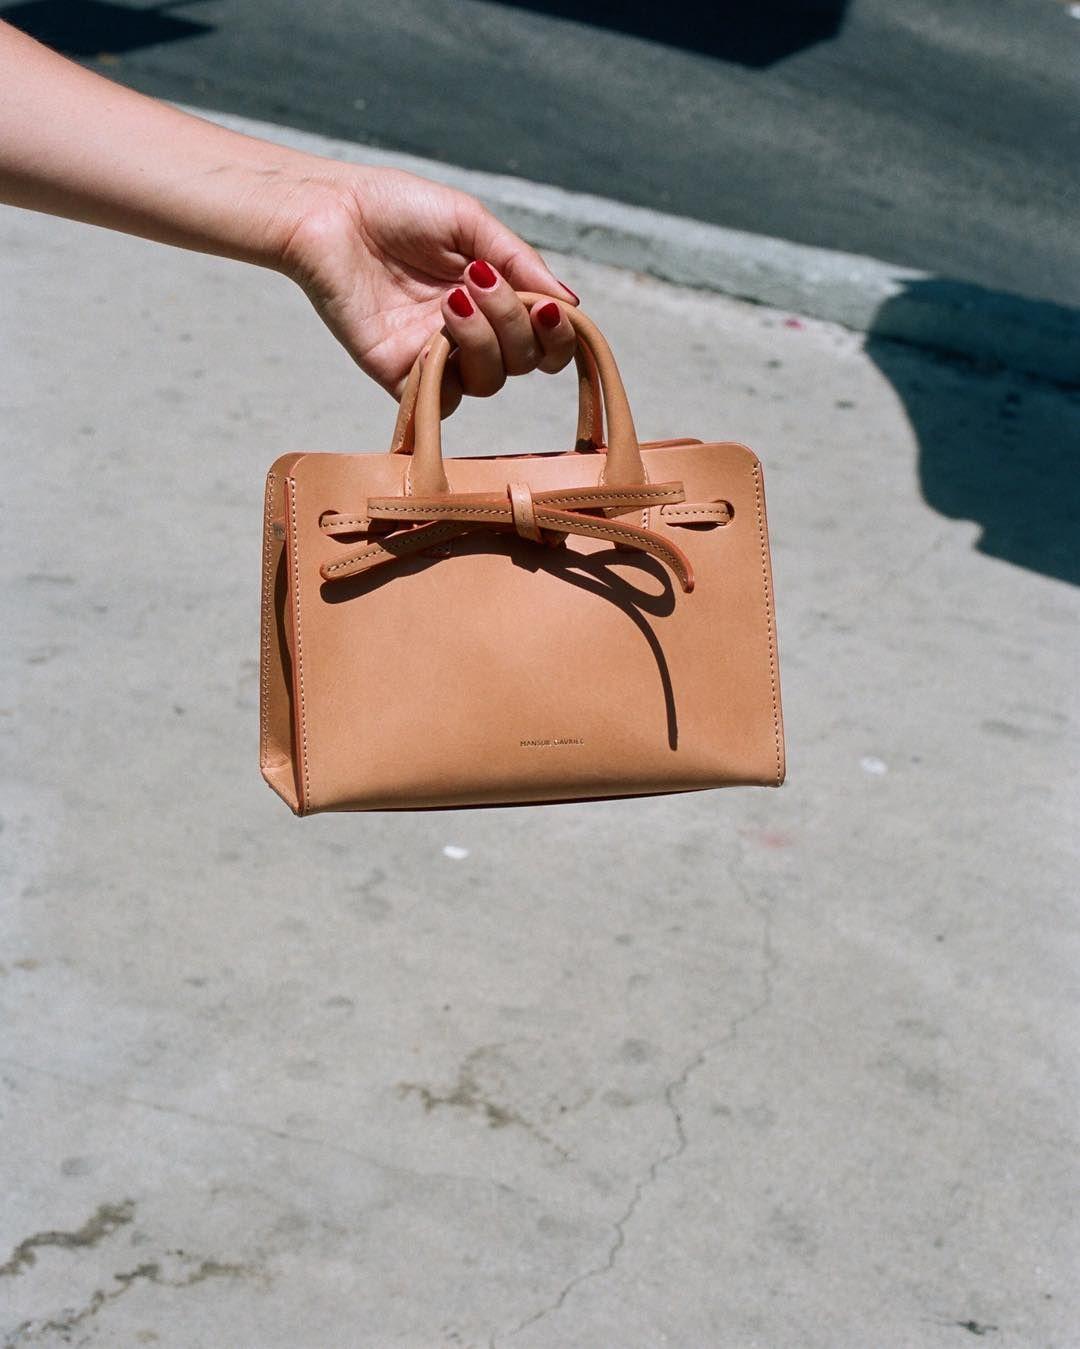 Mini Mini Sun Bag Cammello Bags Kate Spade Top Handle Bag Mansur Gavriel Mini